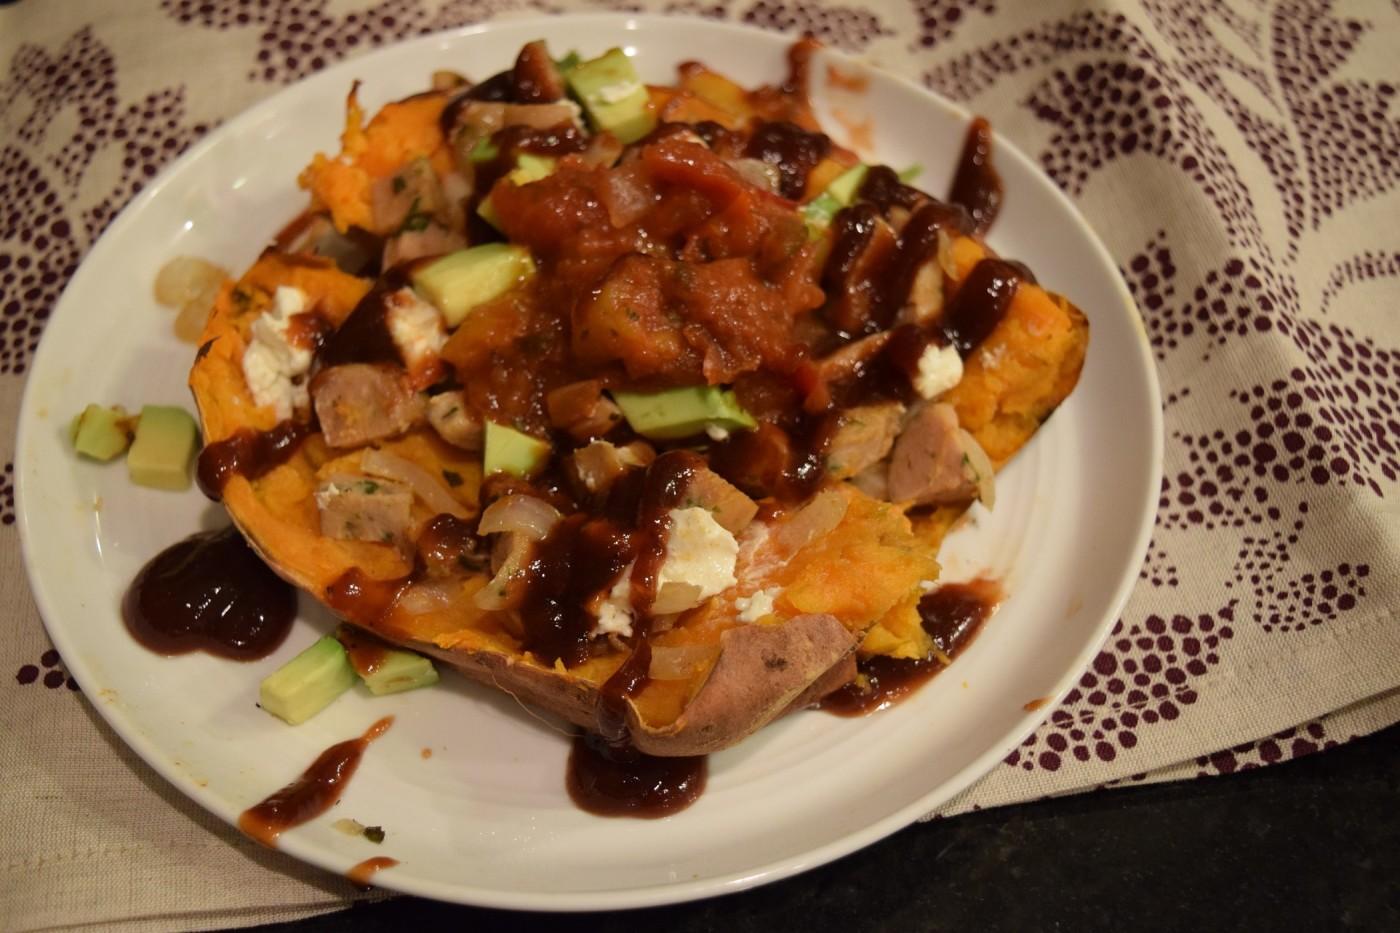 stuffed sweet potato with salsa